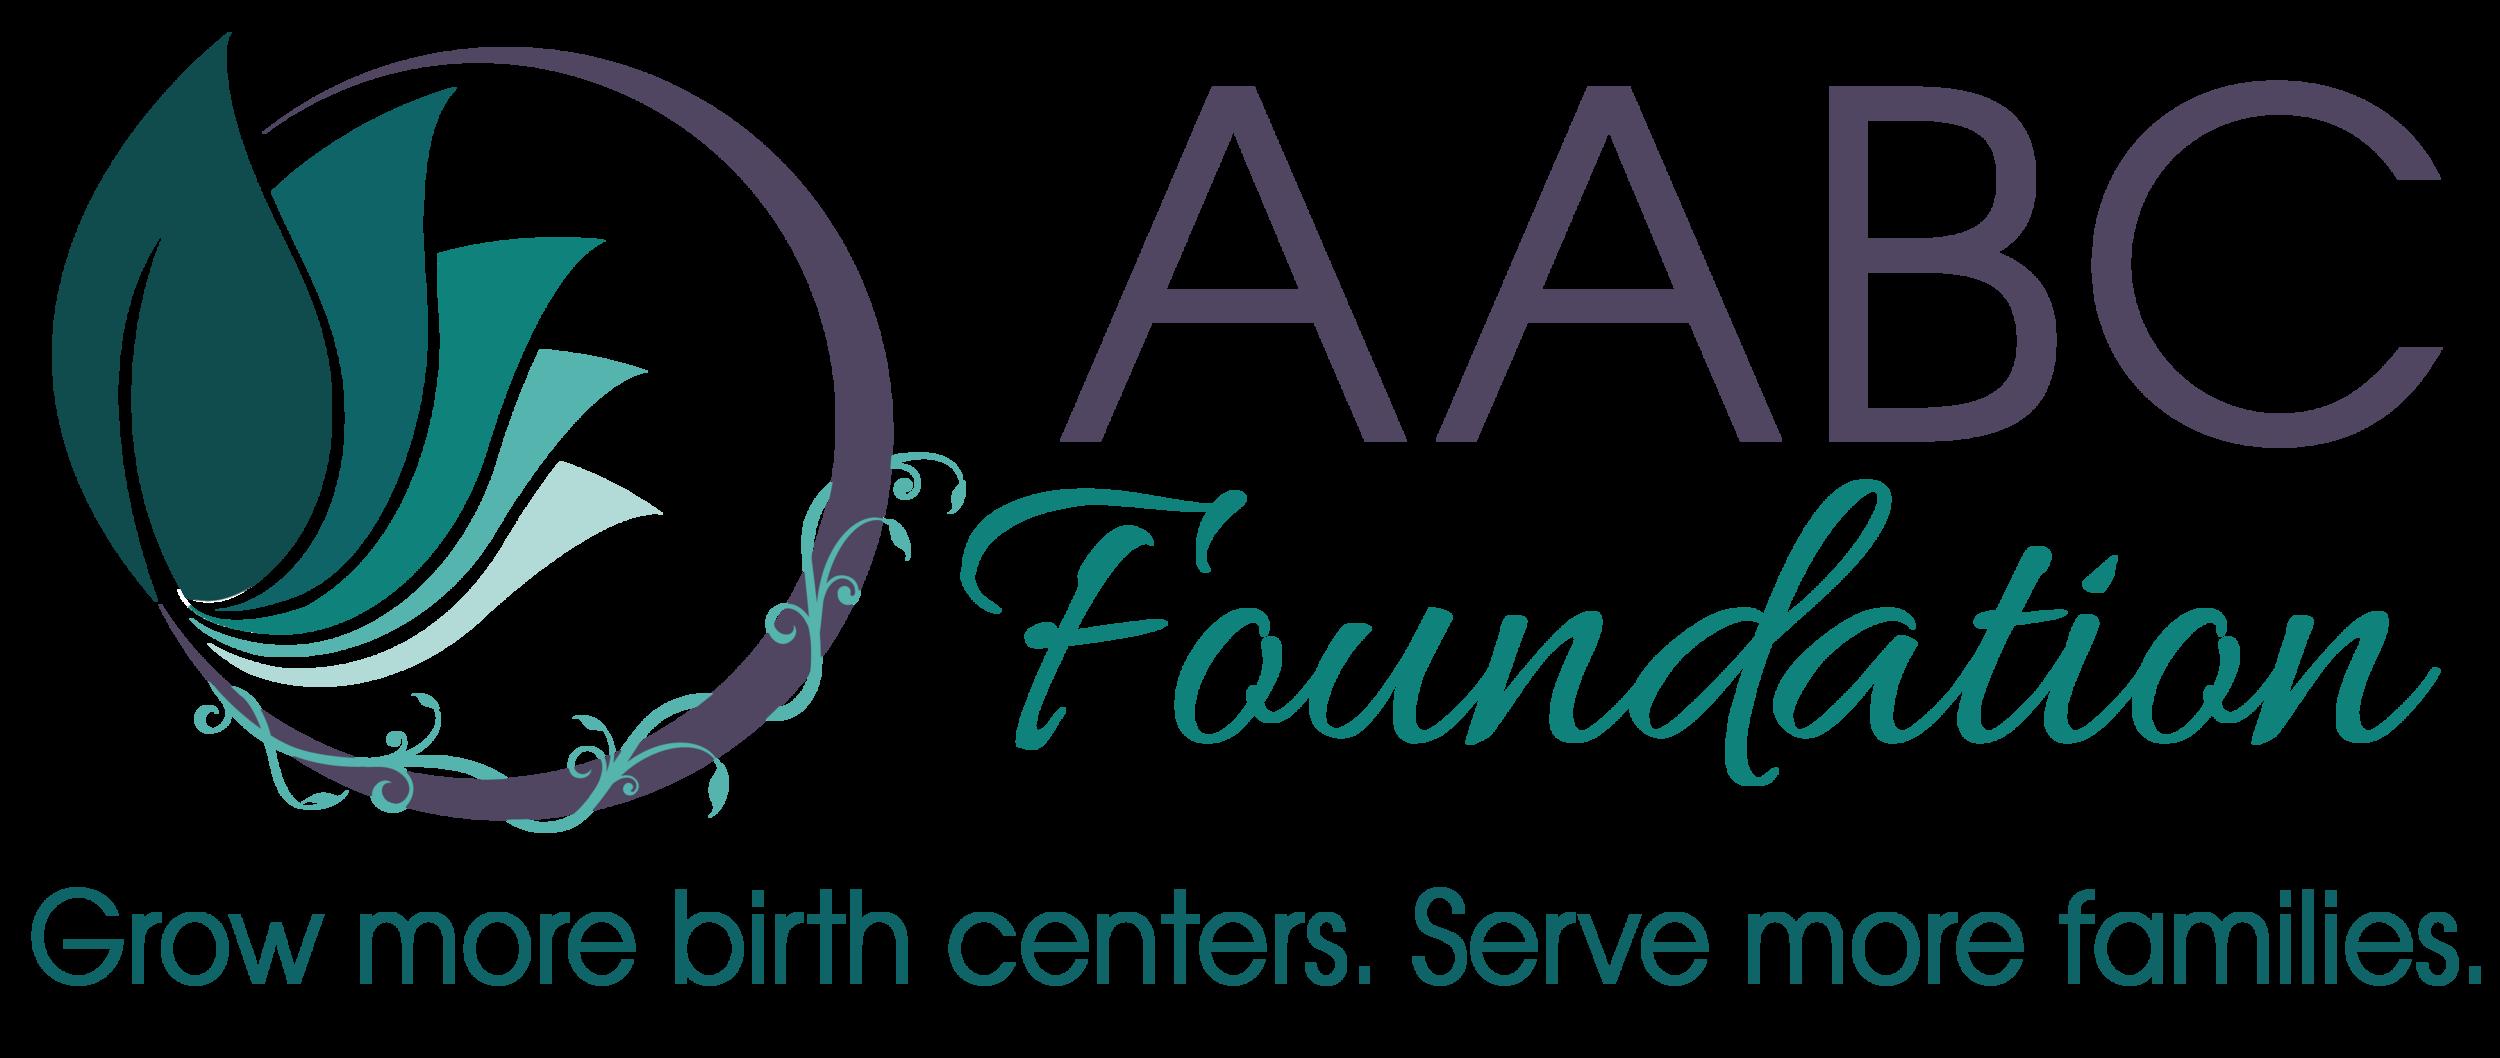 AABC FOUNDATION logo-FINAL-GMBC.png